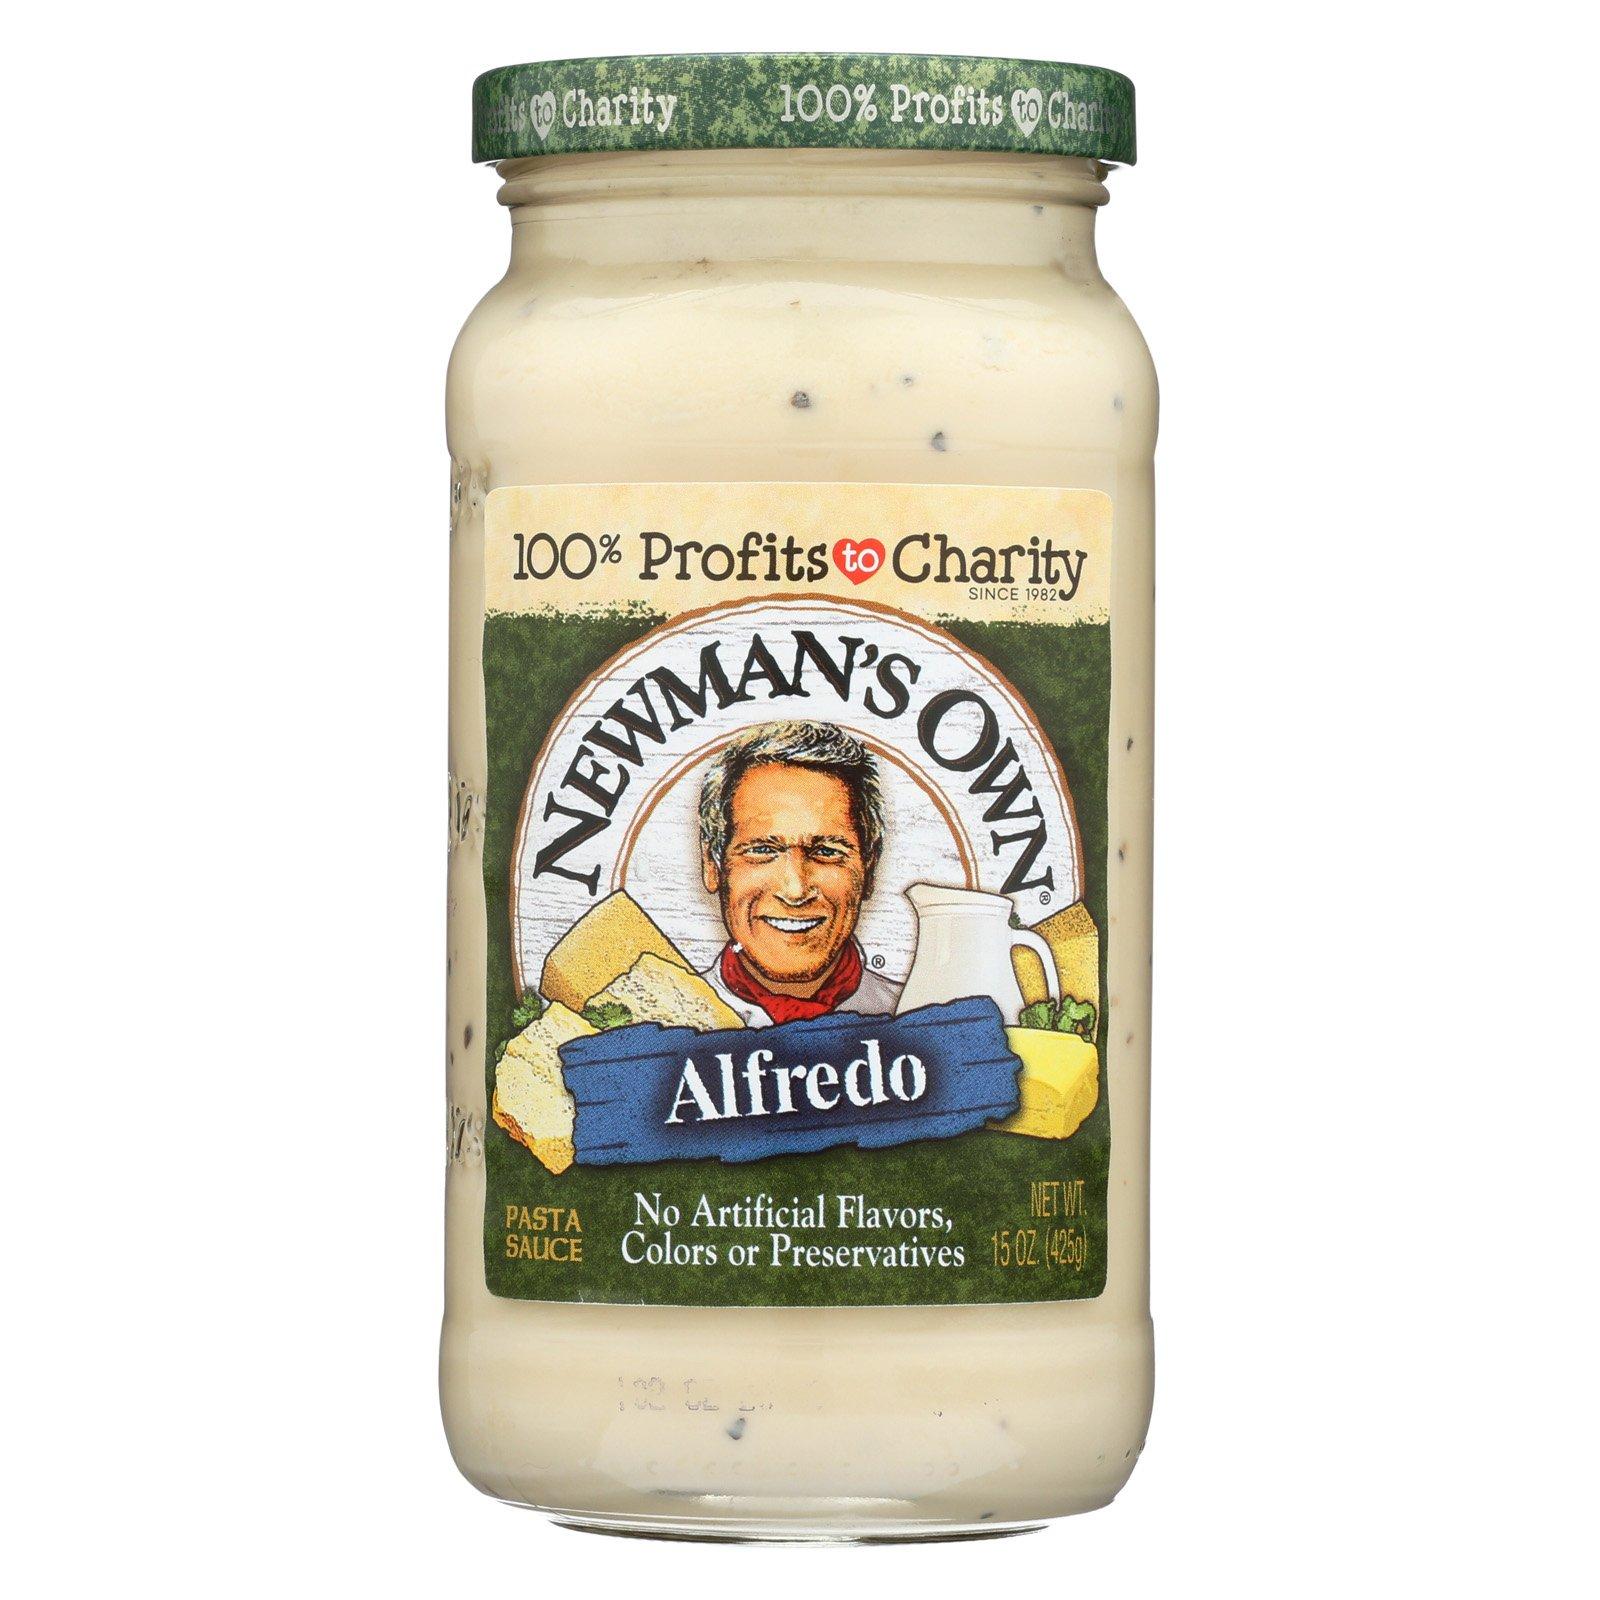 Newman's Own Pasta Sauce - Alfredo - Case of 12 - 15 Fl oz.